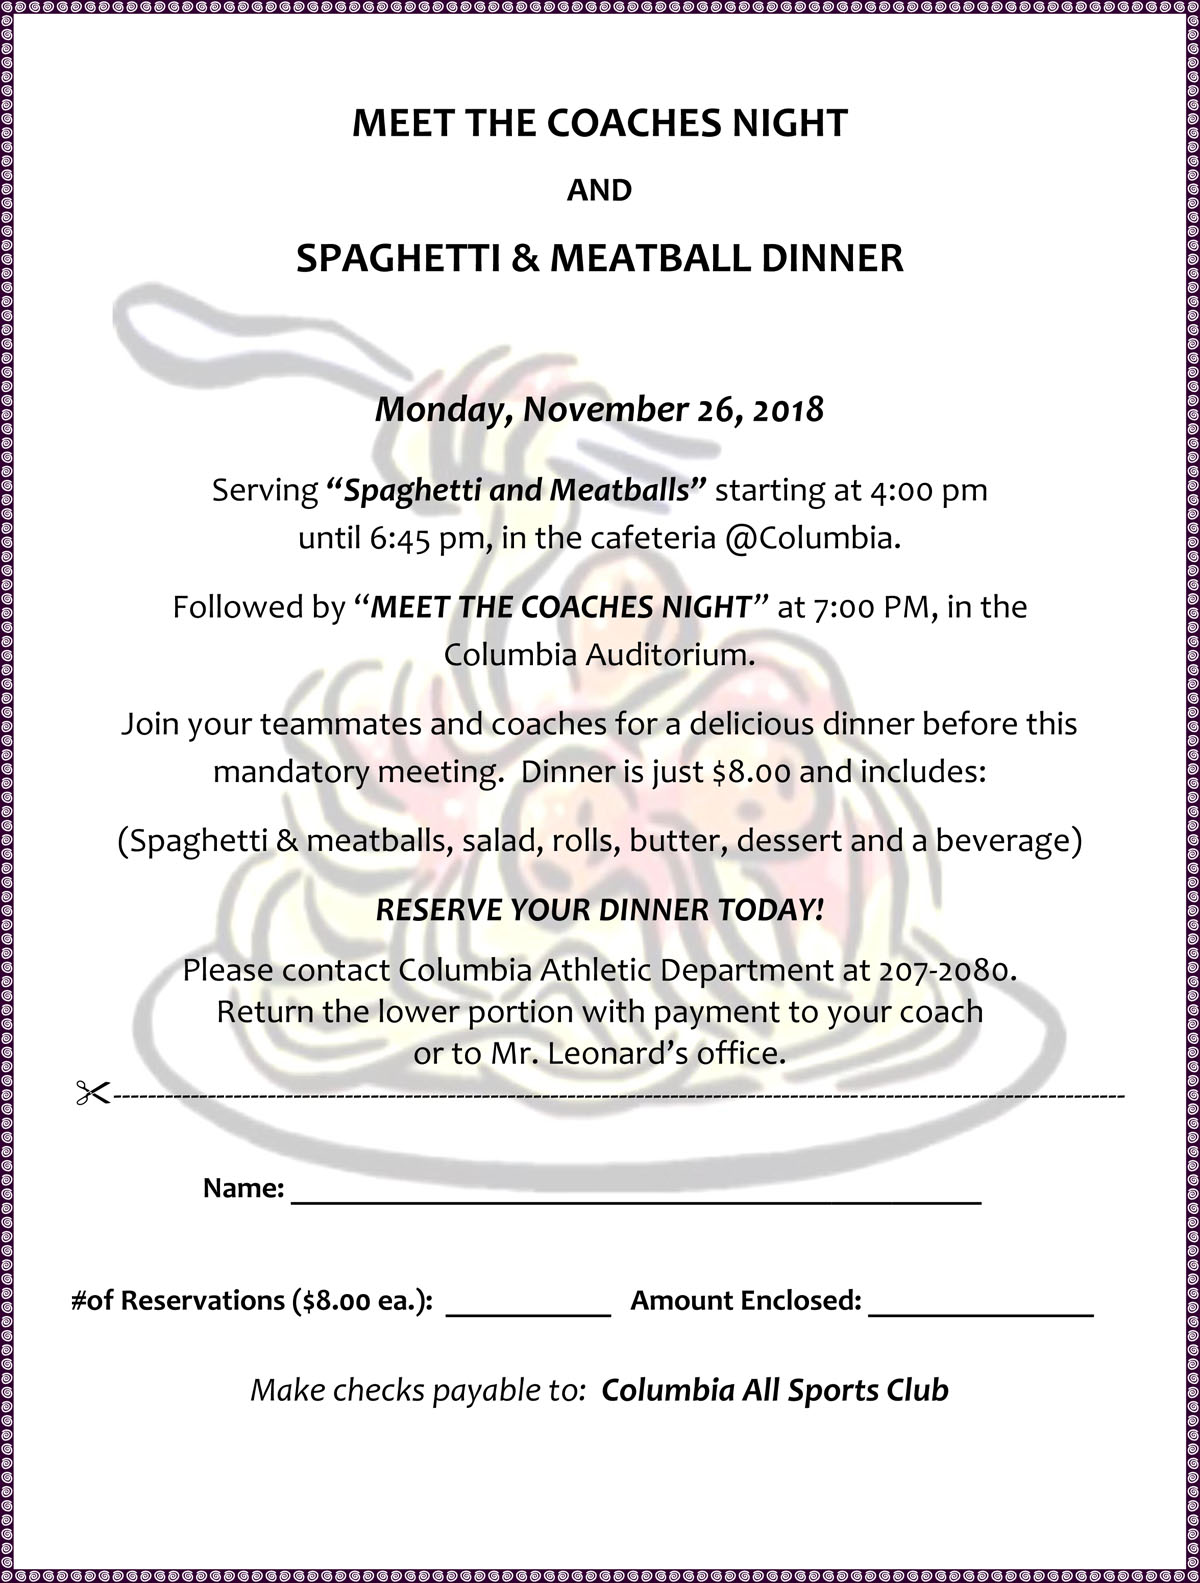 Pasta dinner flyer